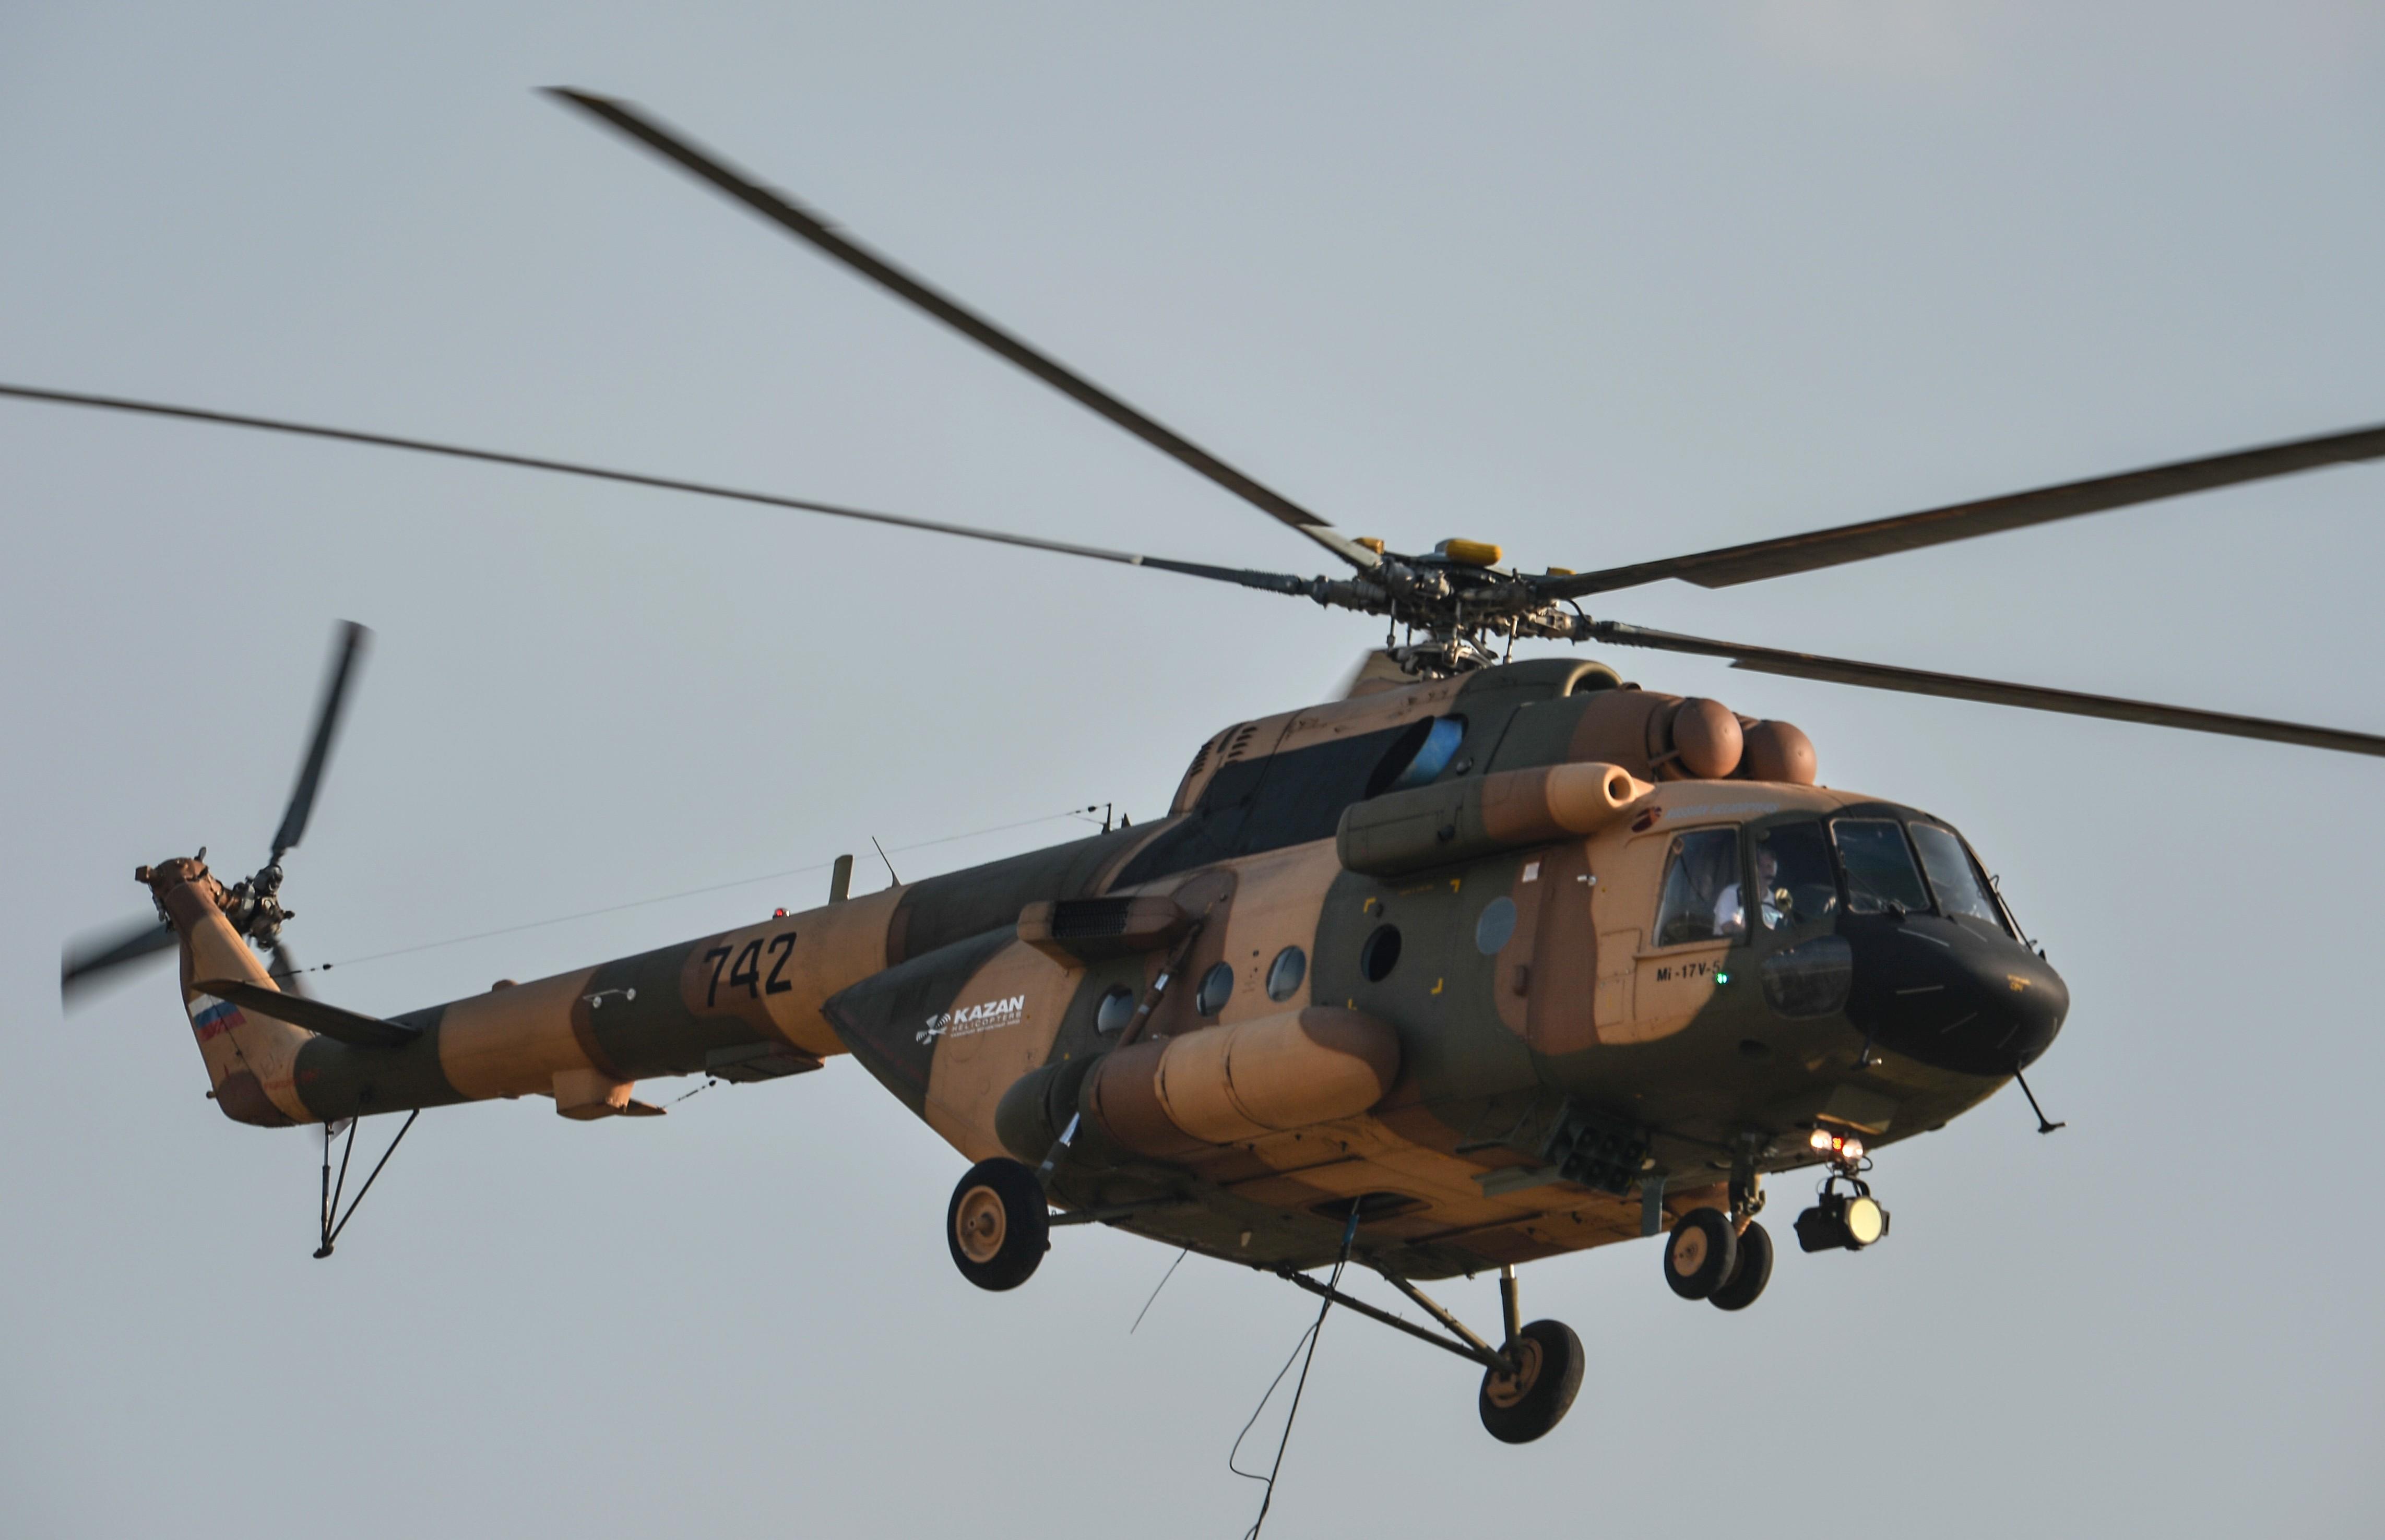 <p>Вертолет Ми-17В-5. Фото: &copy; РИА Новости/Владимир Астапкович</p>